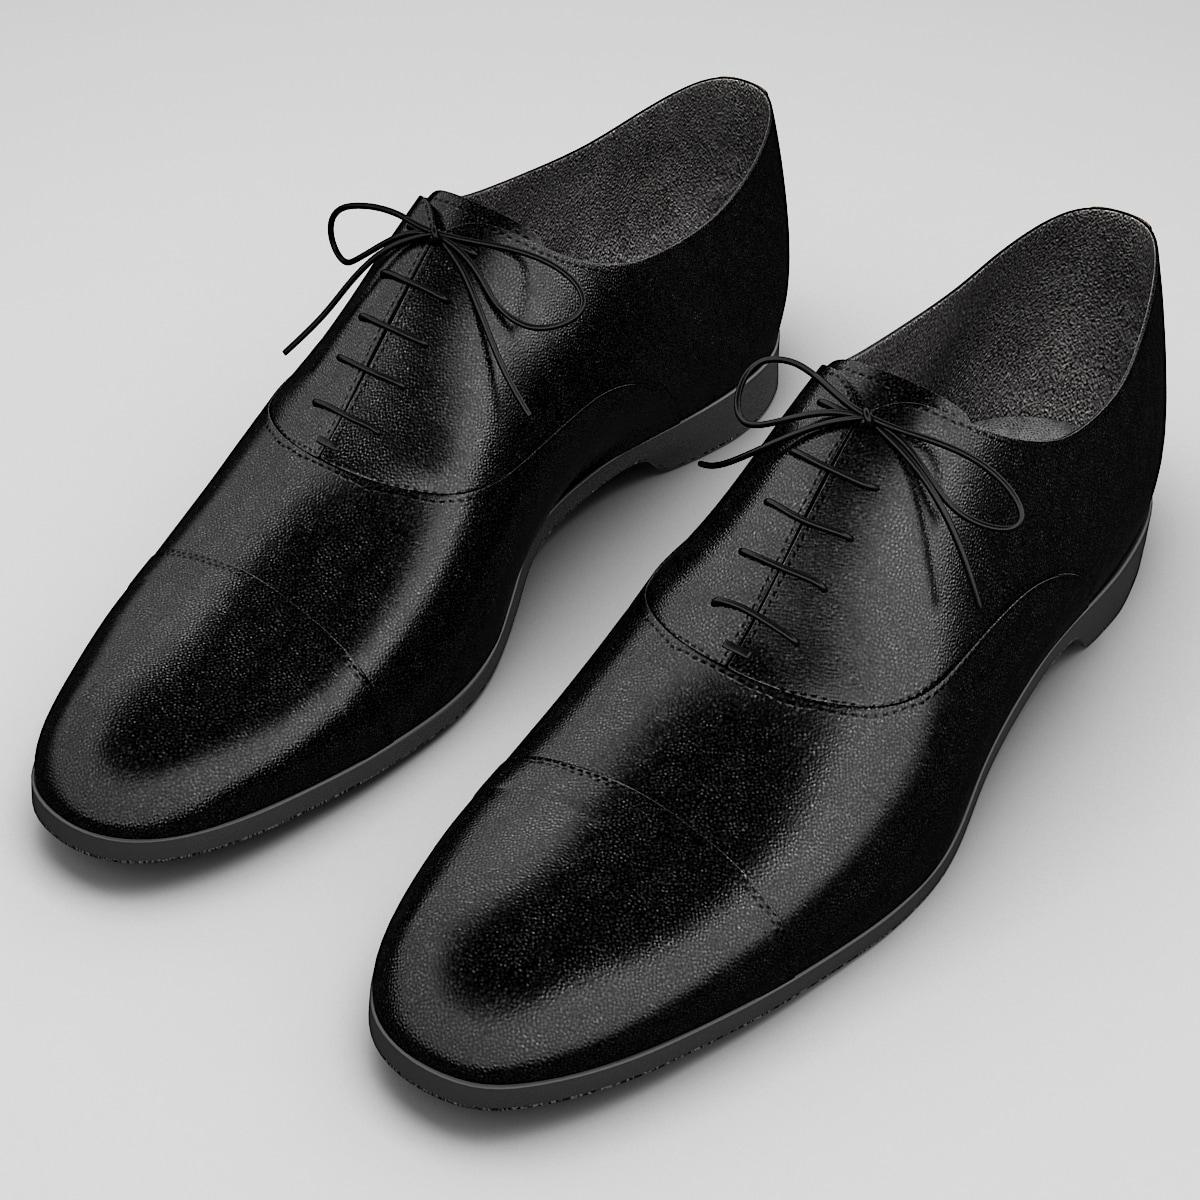 Mens_Shoes_Ralph_Lauren_0001.jpg